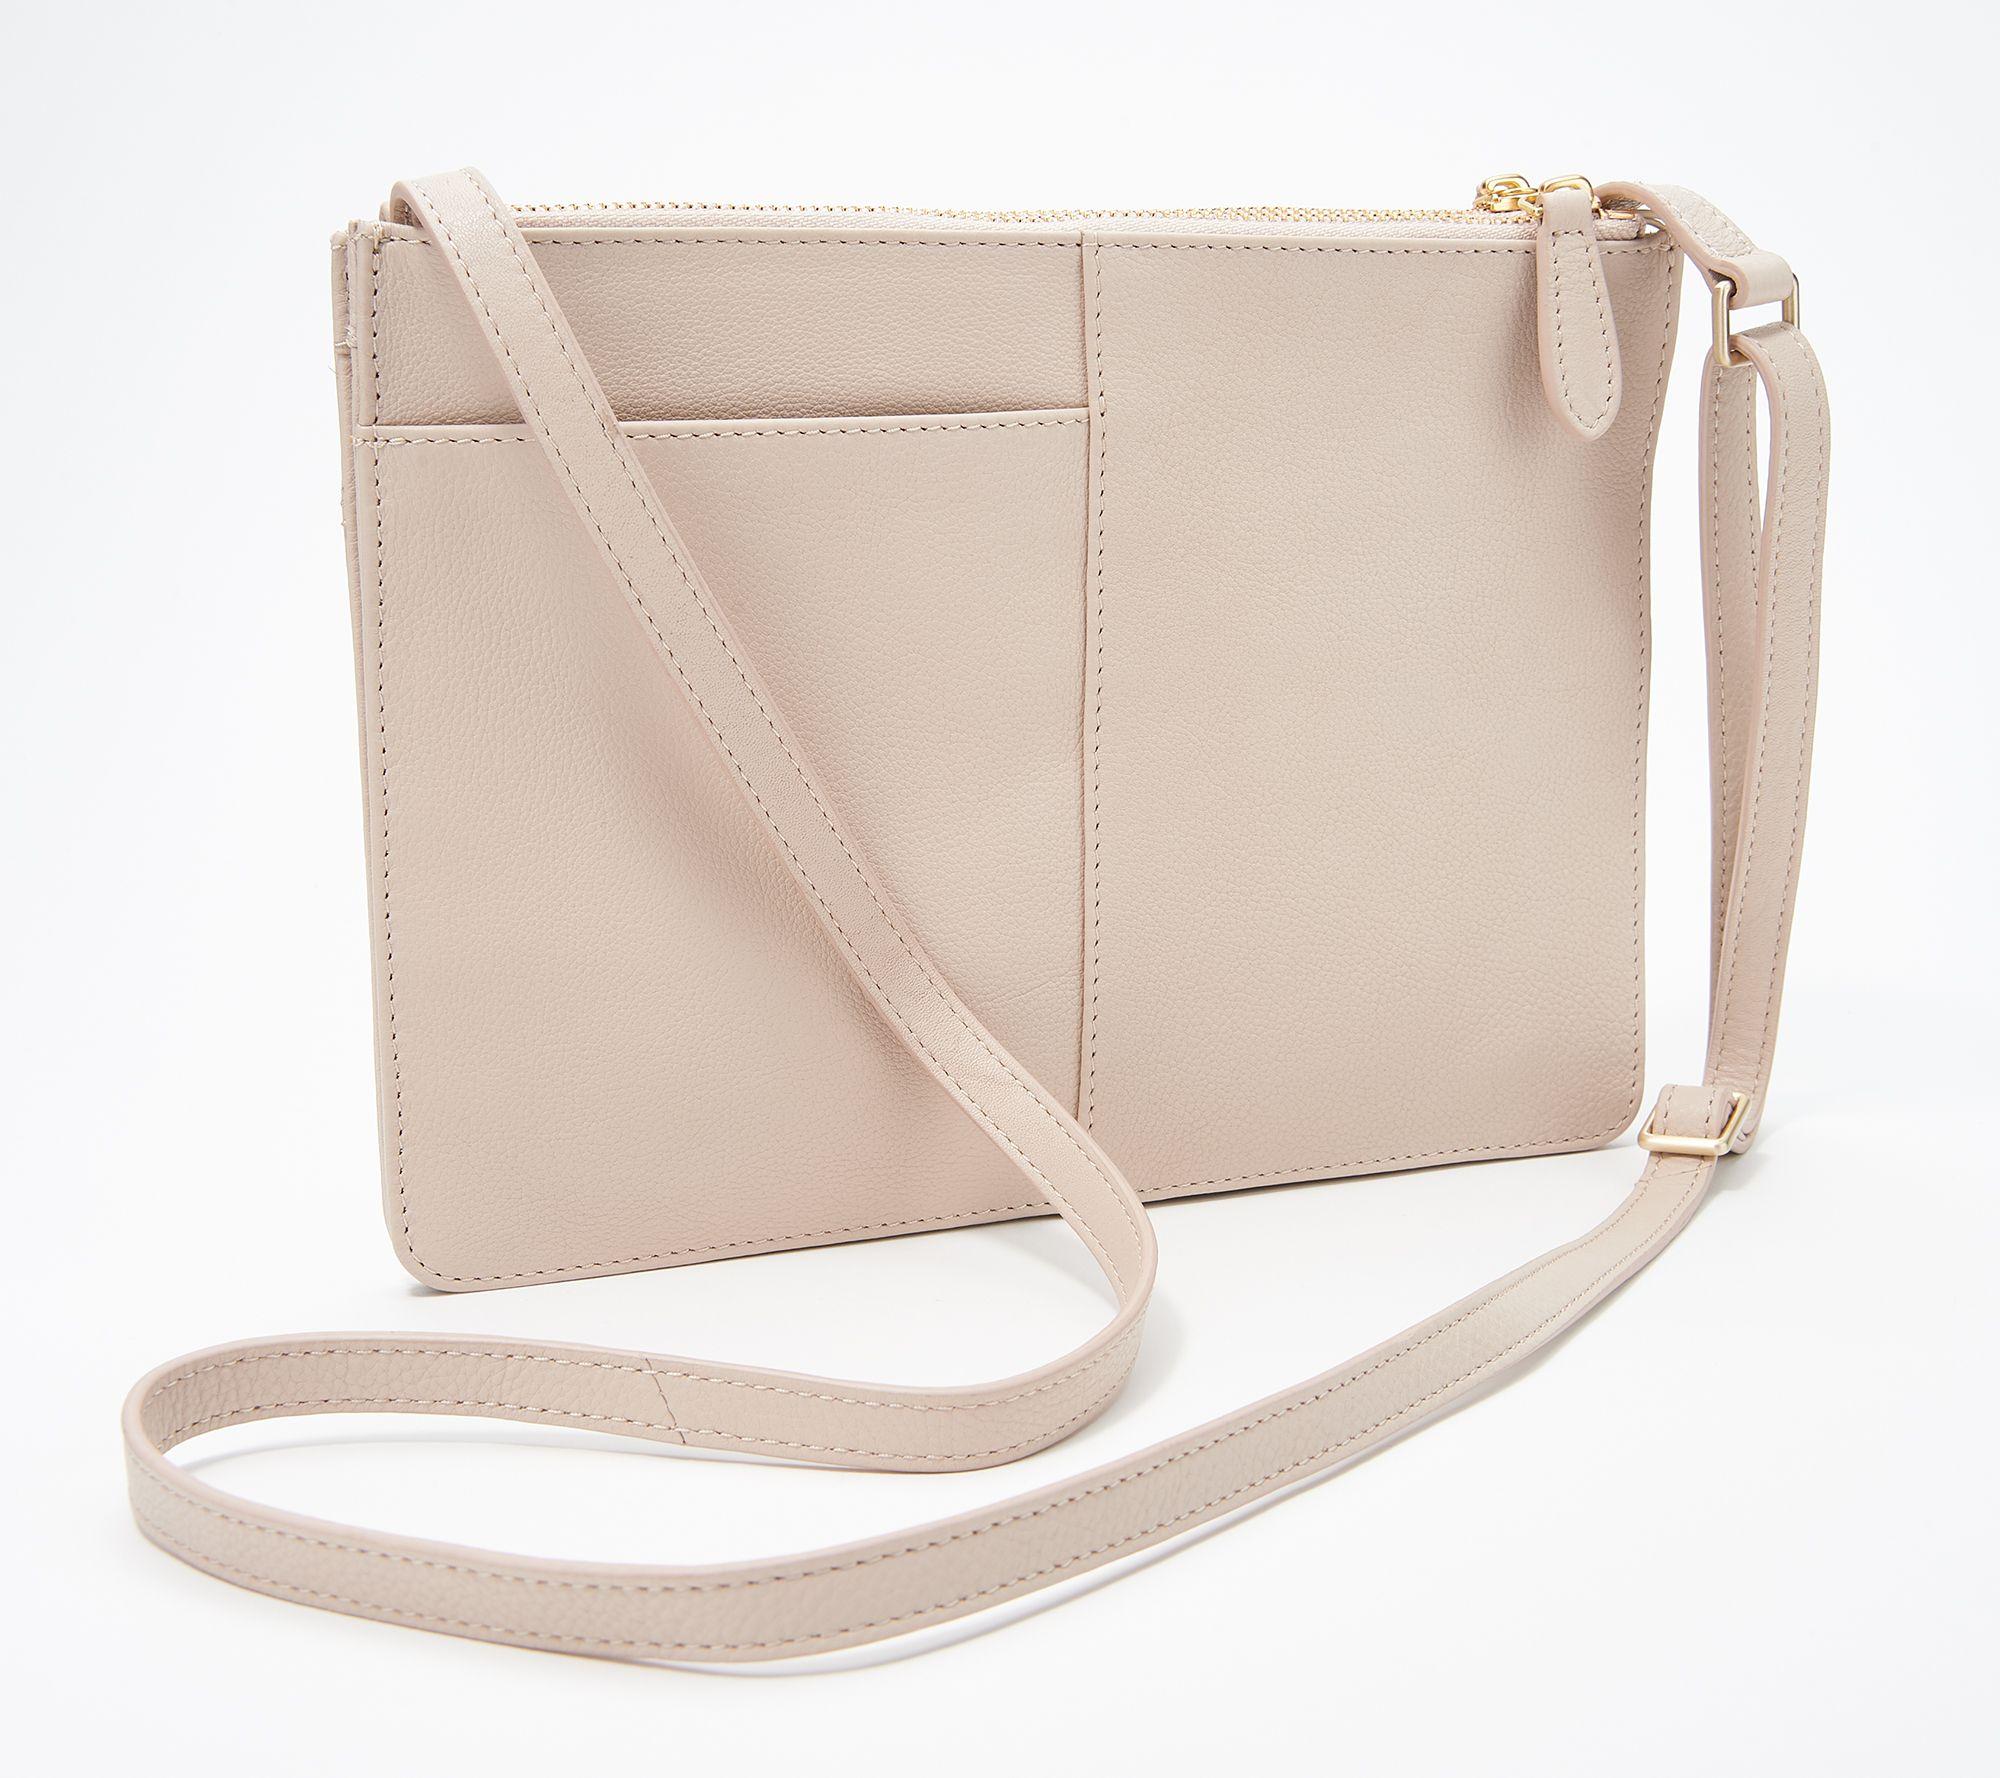 df1462e21b4 RADLEY London Pocket Leather Medium Crossbody Handbag - Page 1 — QVC.com